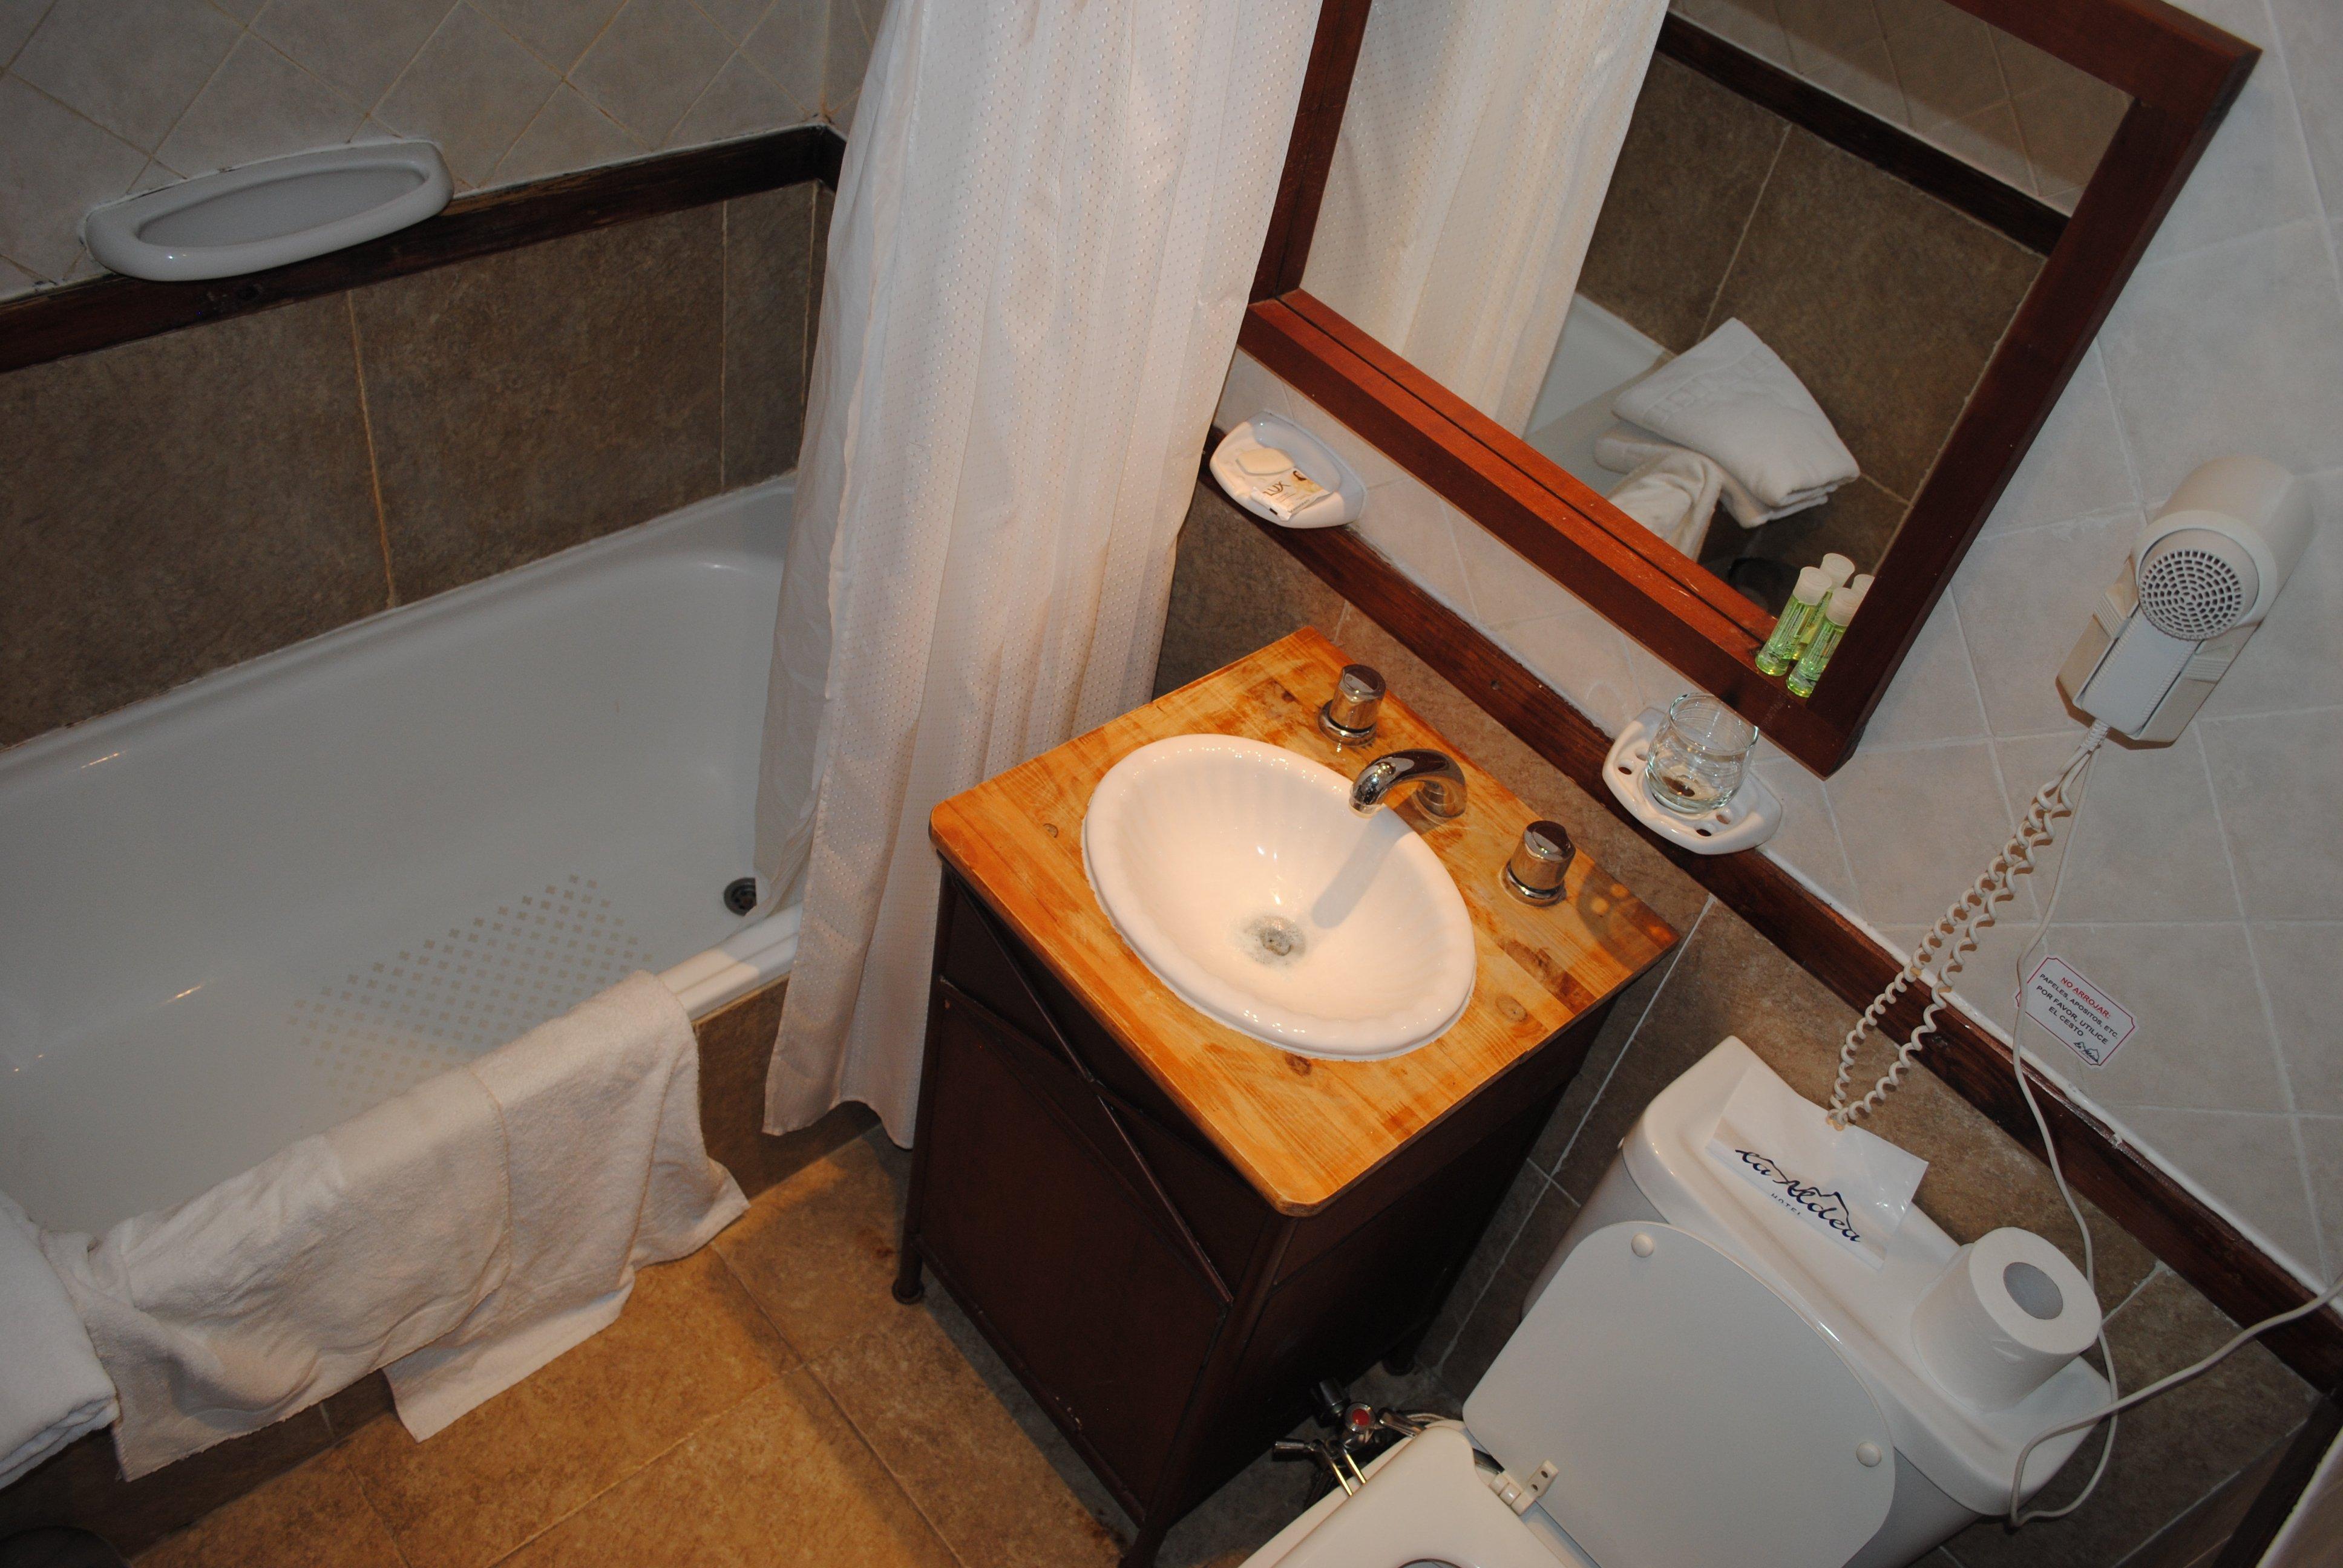 Hotel Review: La Aldea, Chalten